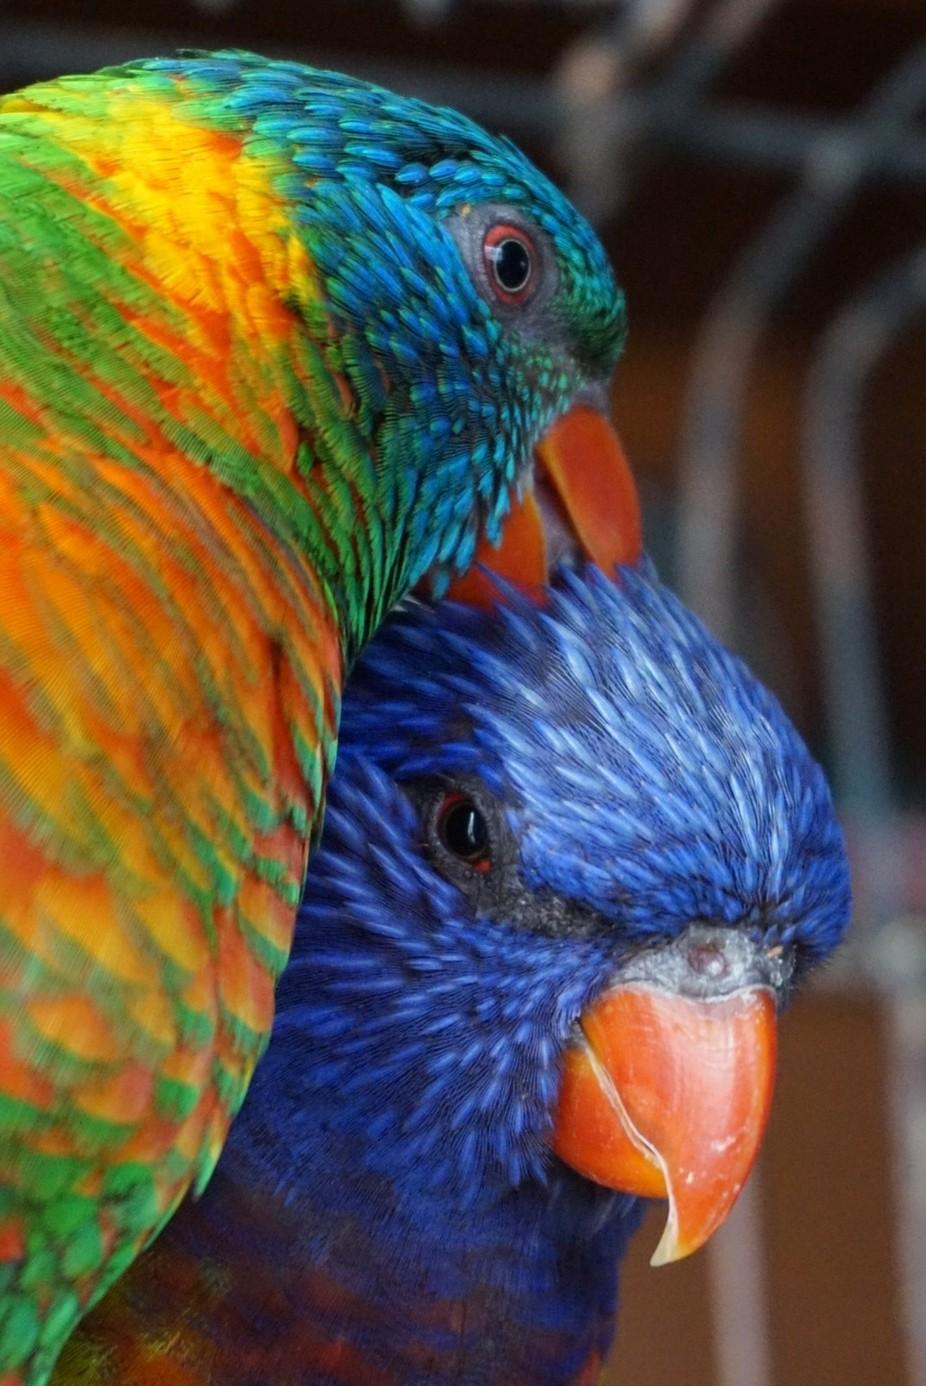 Rainbow lorikeets bonding